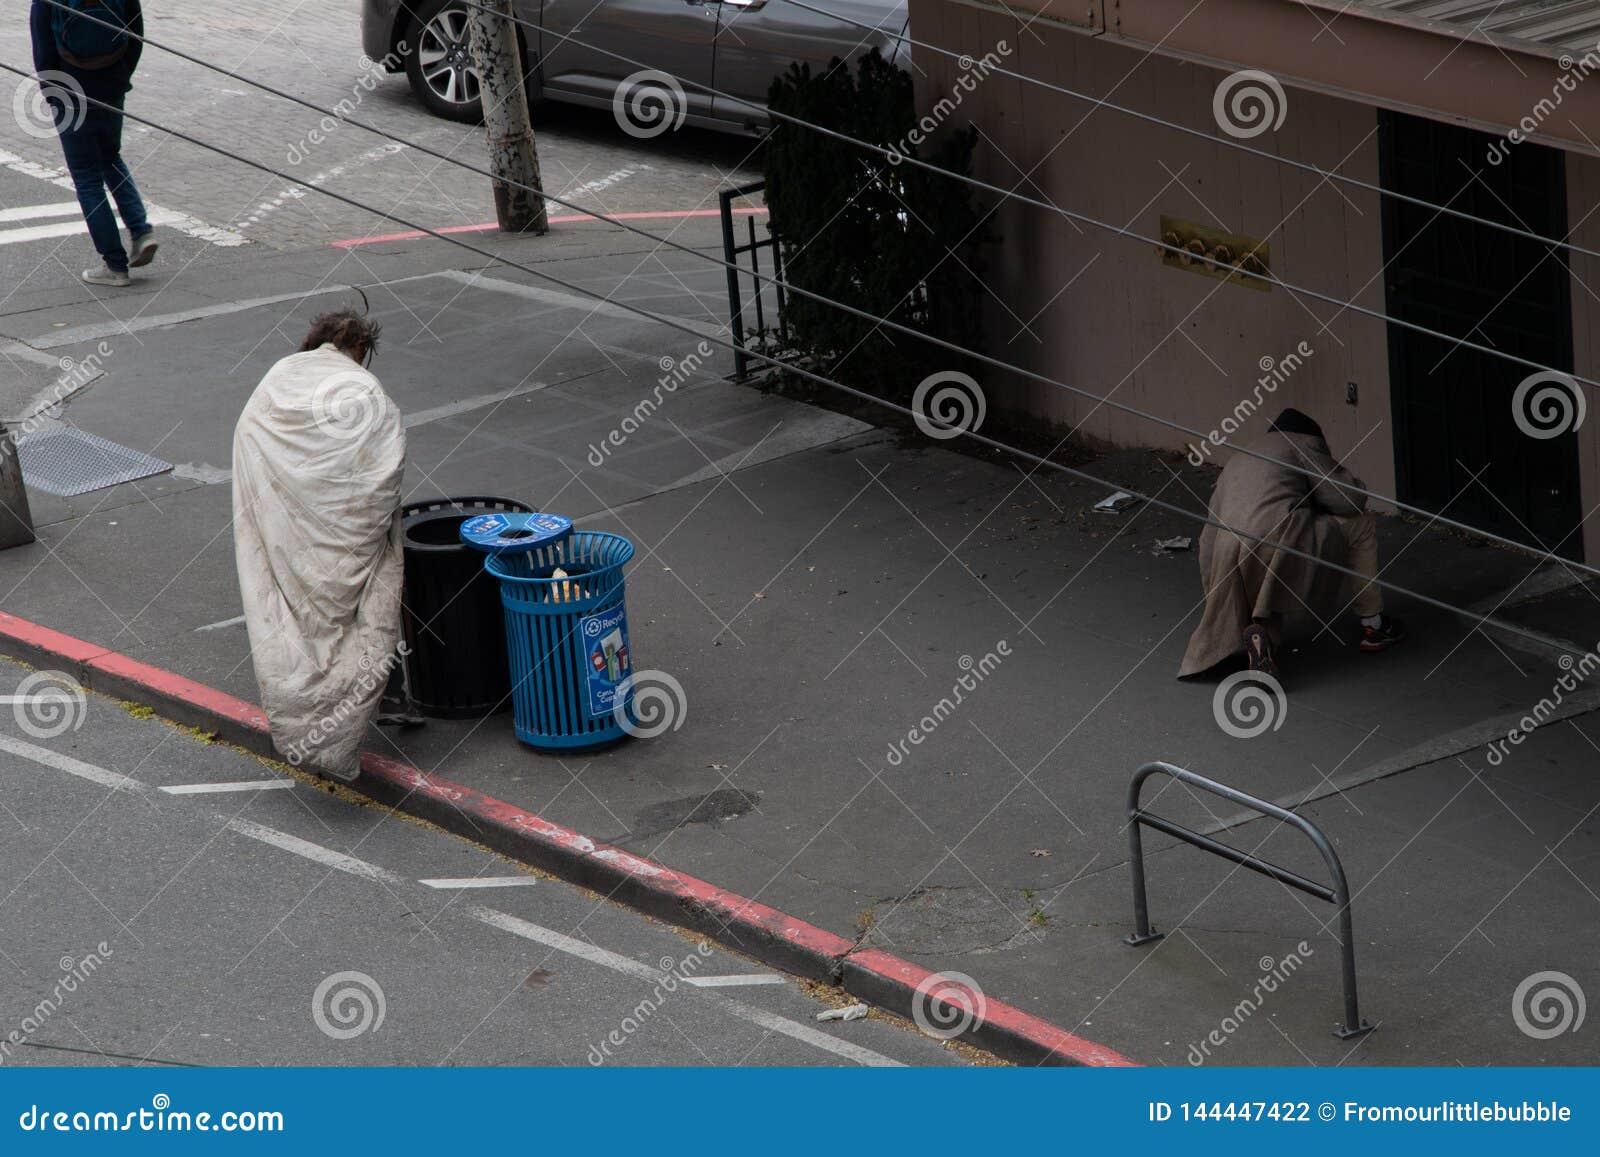 Pair of homeless men in seattle